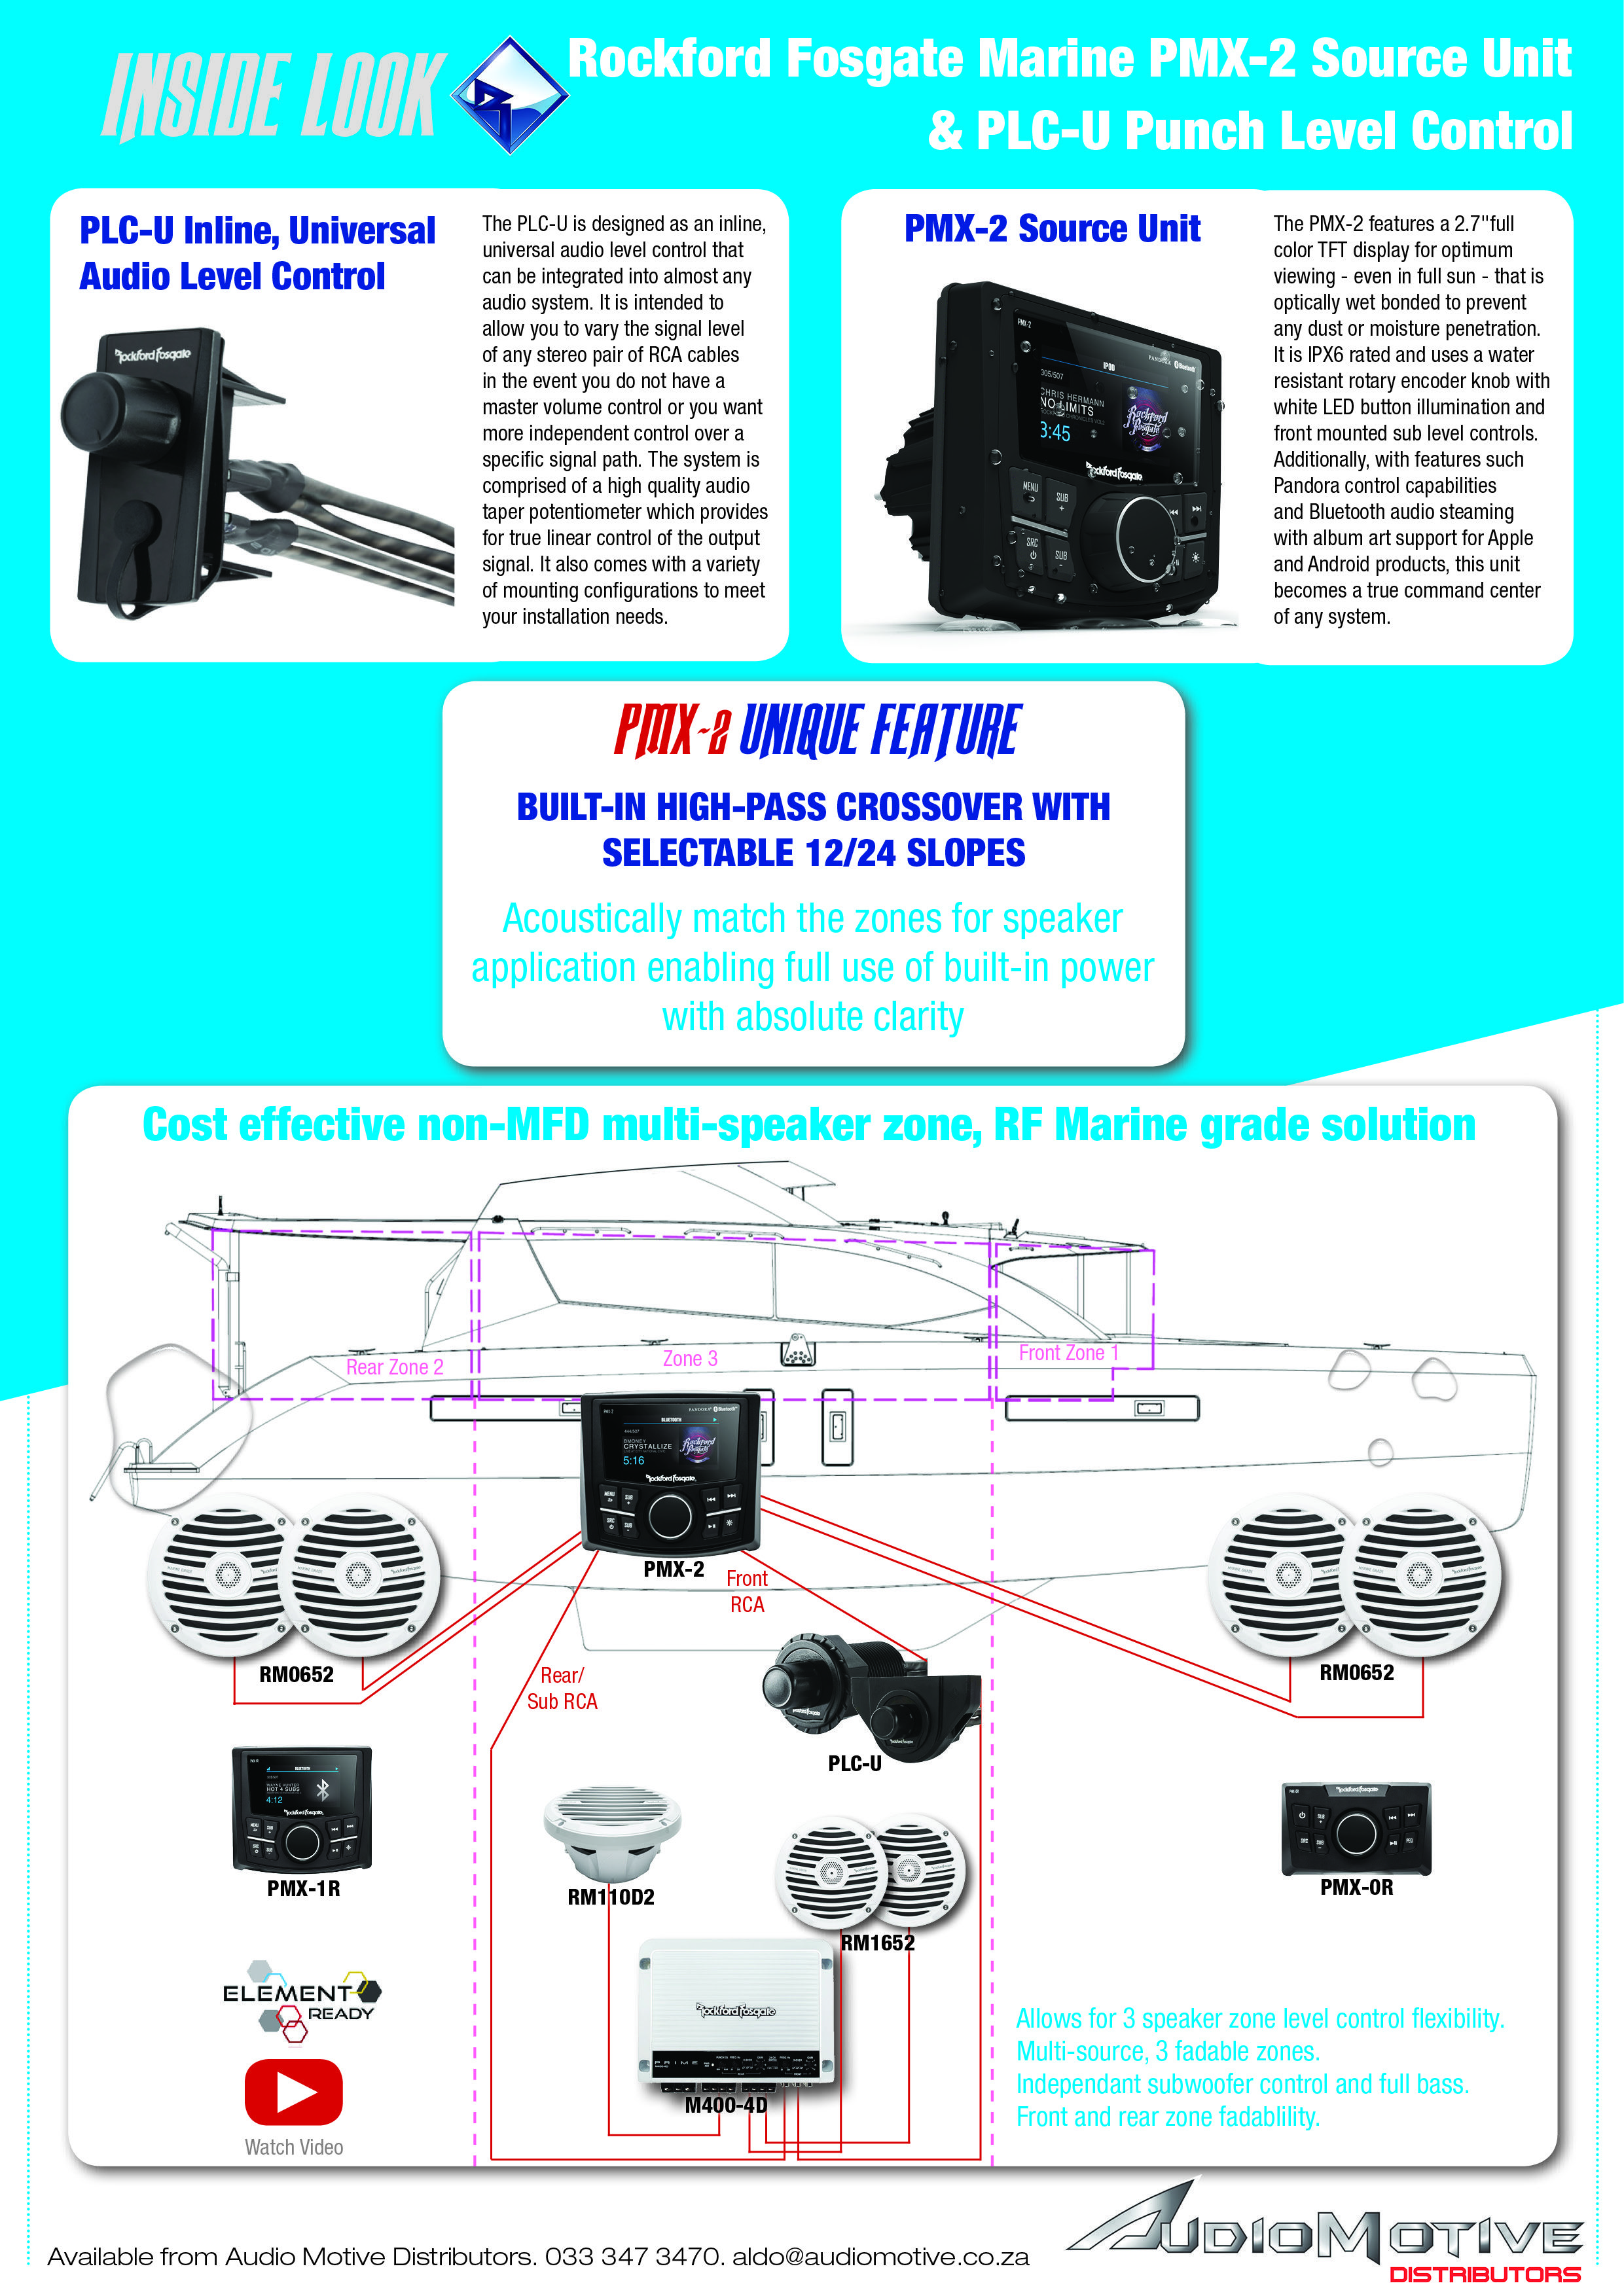 marineaudio boataudio boatsound sourceunit soundforboat rockford fosgate boat sound system setup pmx 2 [ 2481 x 3508 Pixel ]